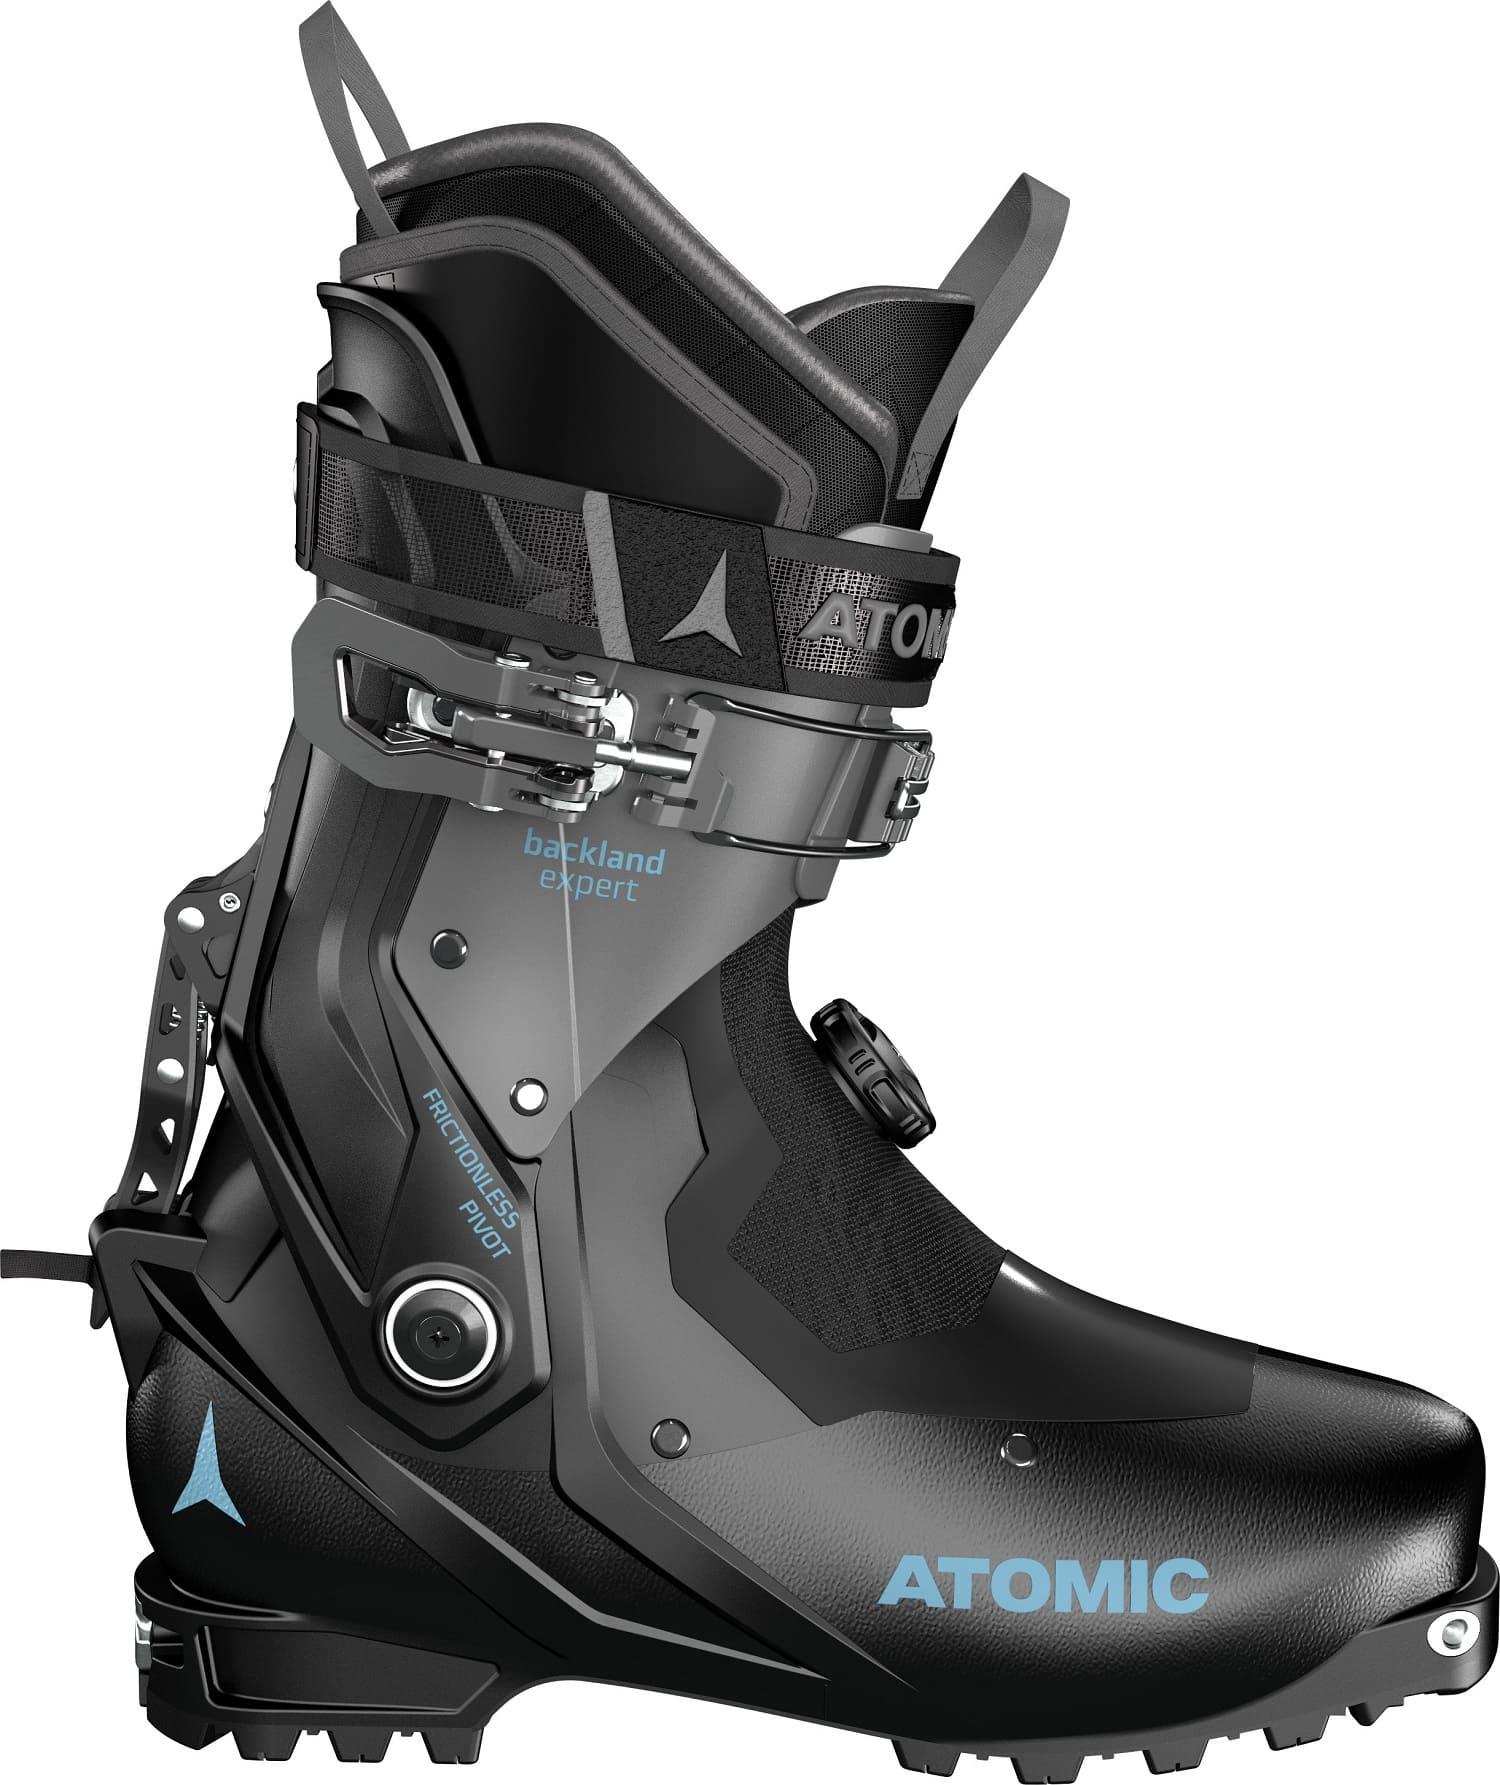 ATOMIC BACKLAND EXPERT DAMEN Black/Anthracite/Light - 24/24.5